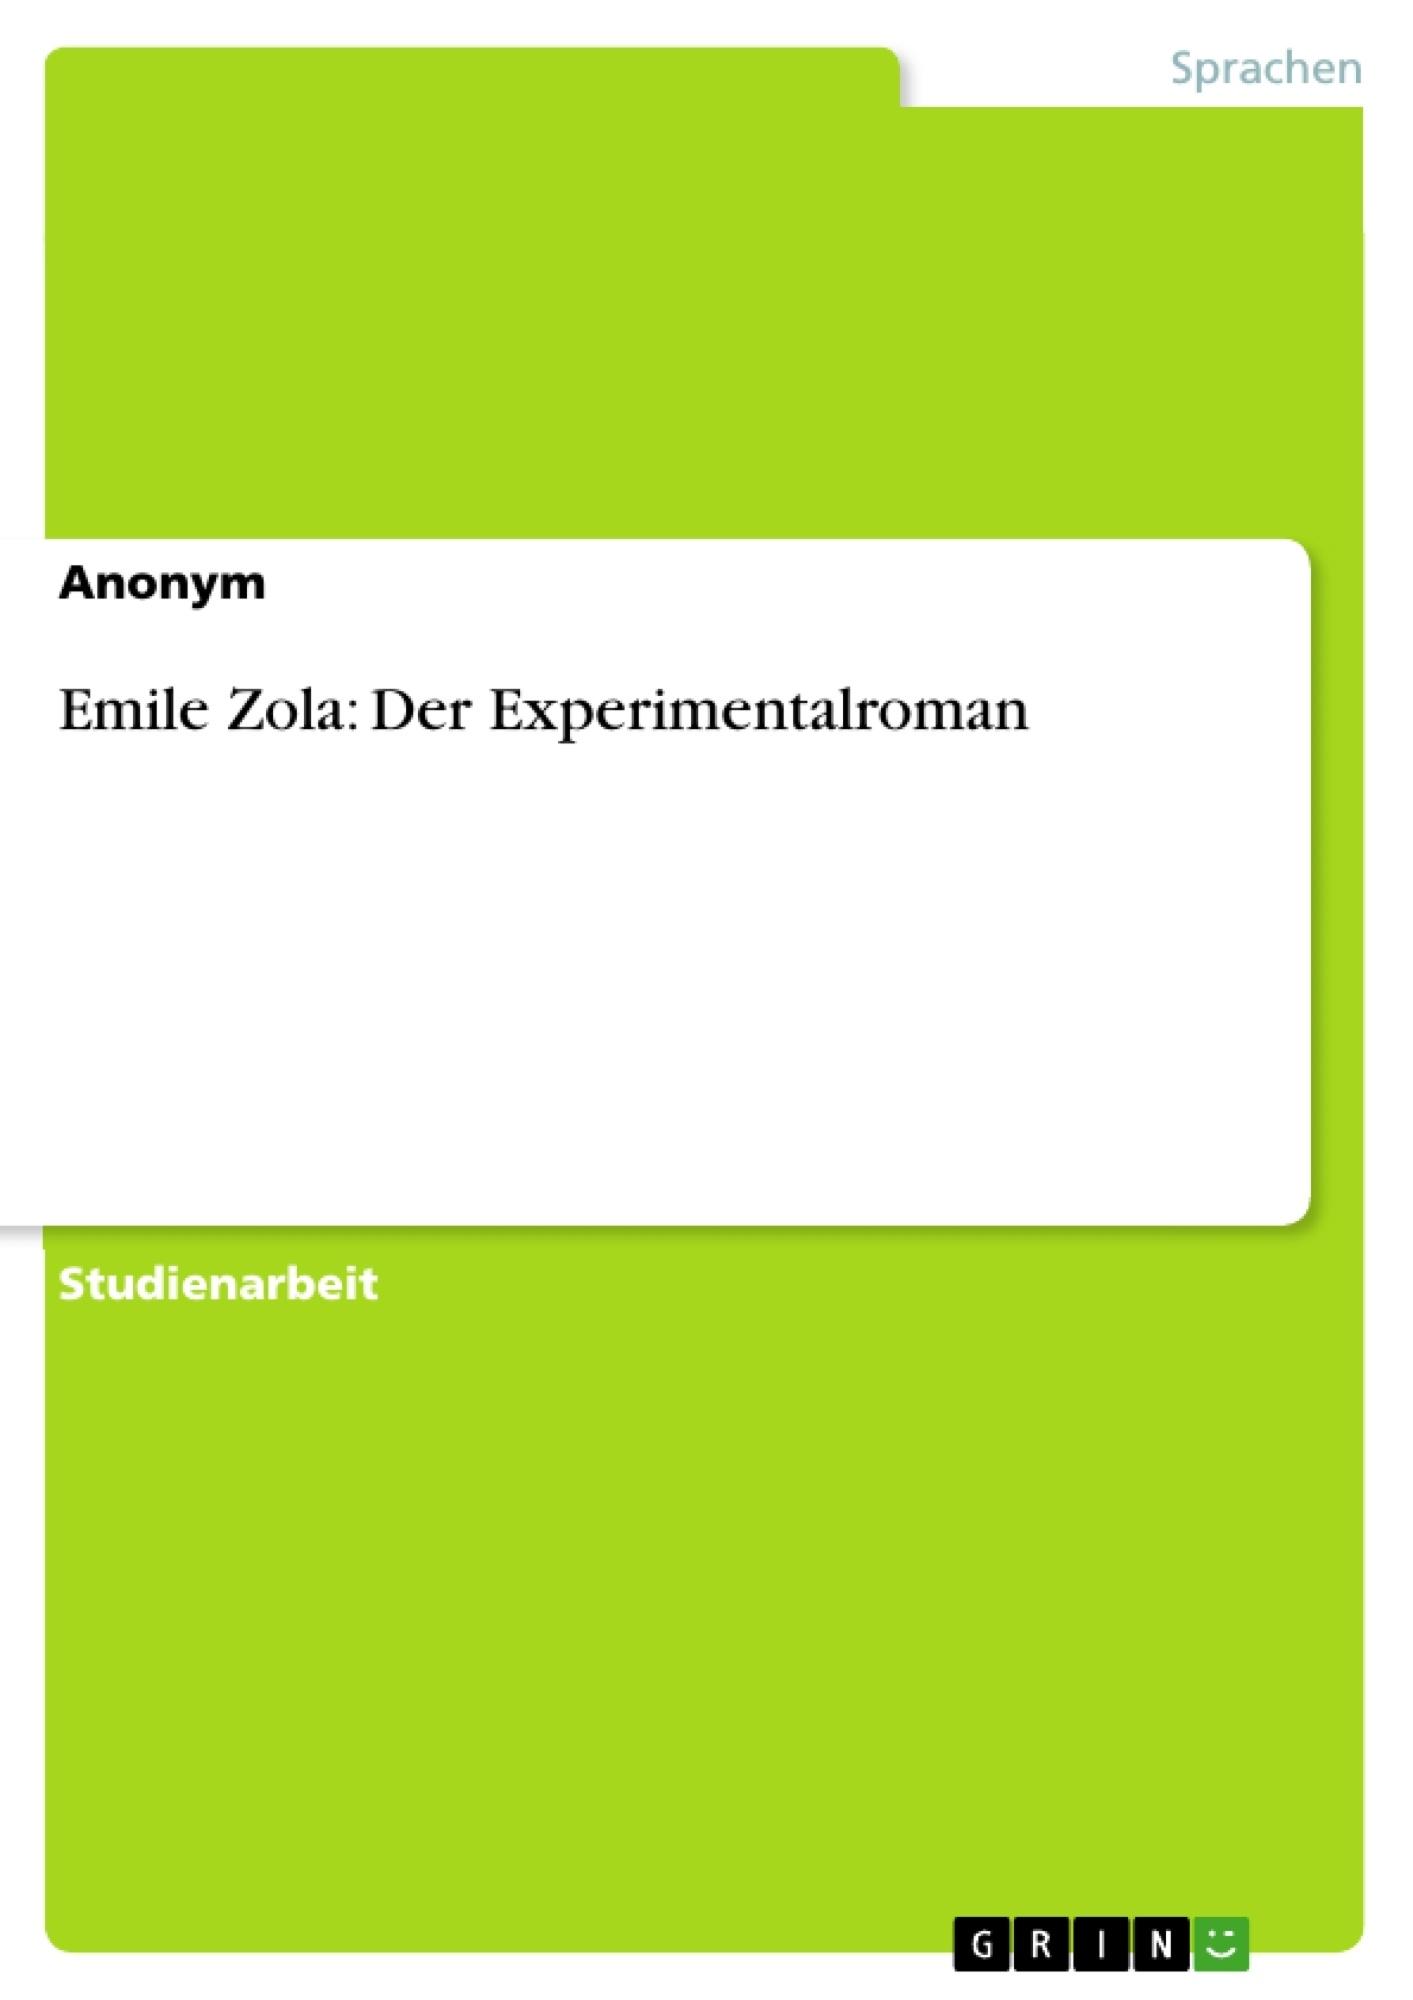 Titel: Emile Zola: Der Experimentalroman